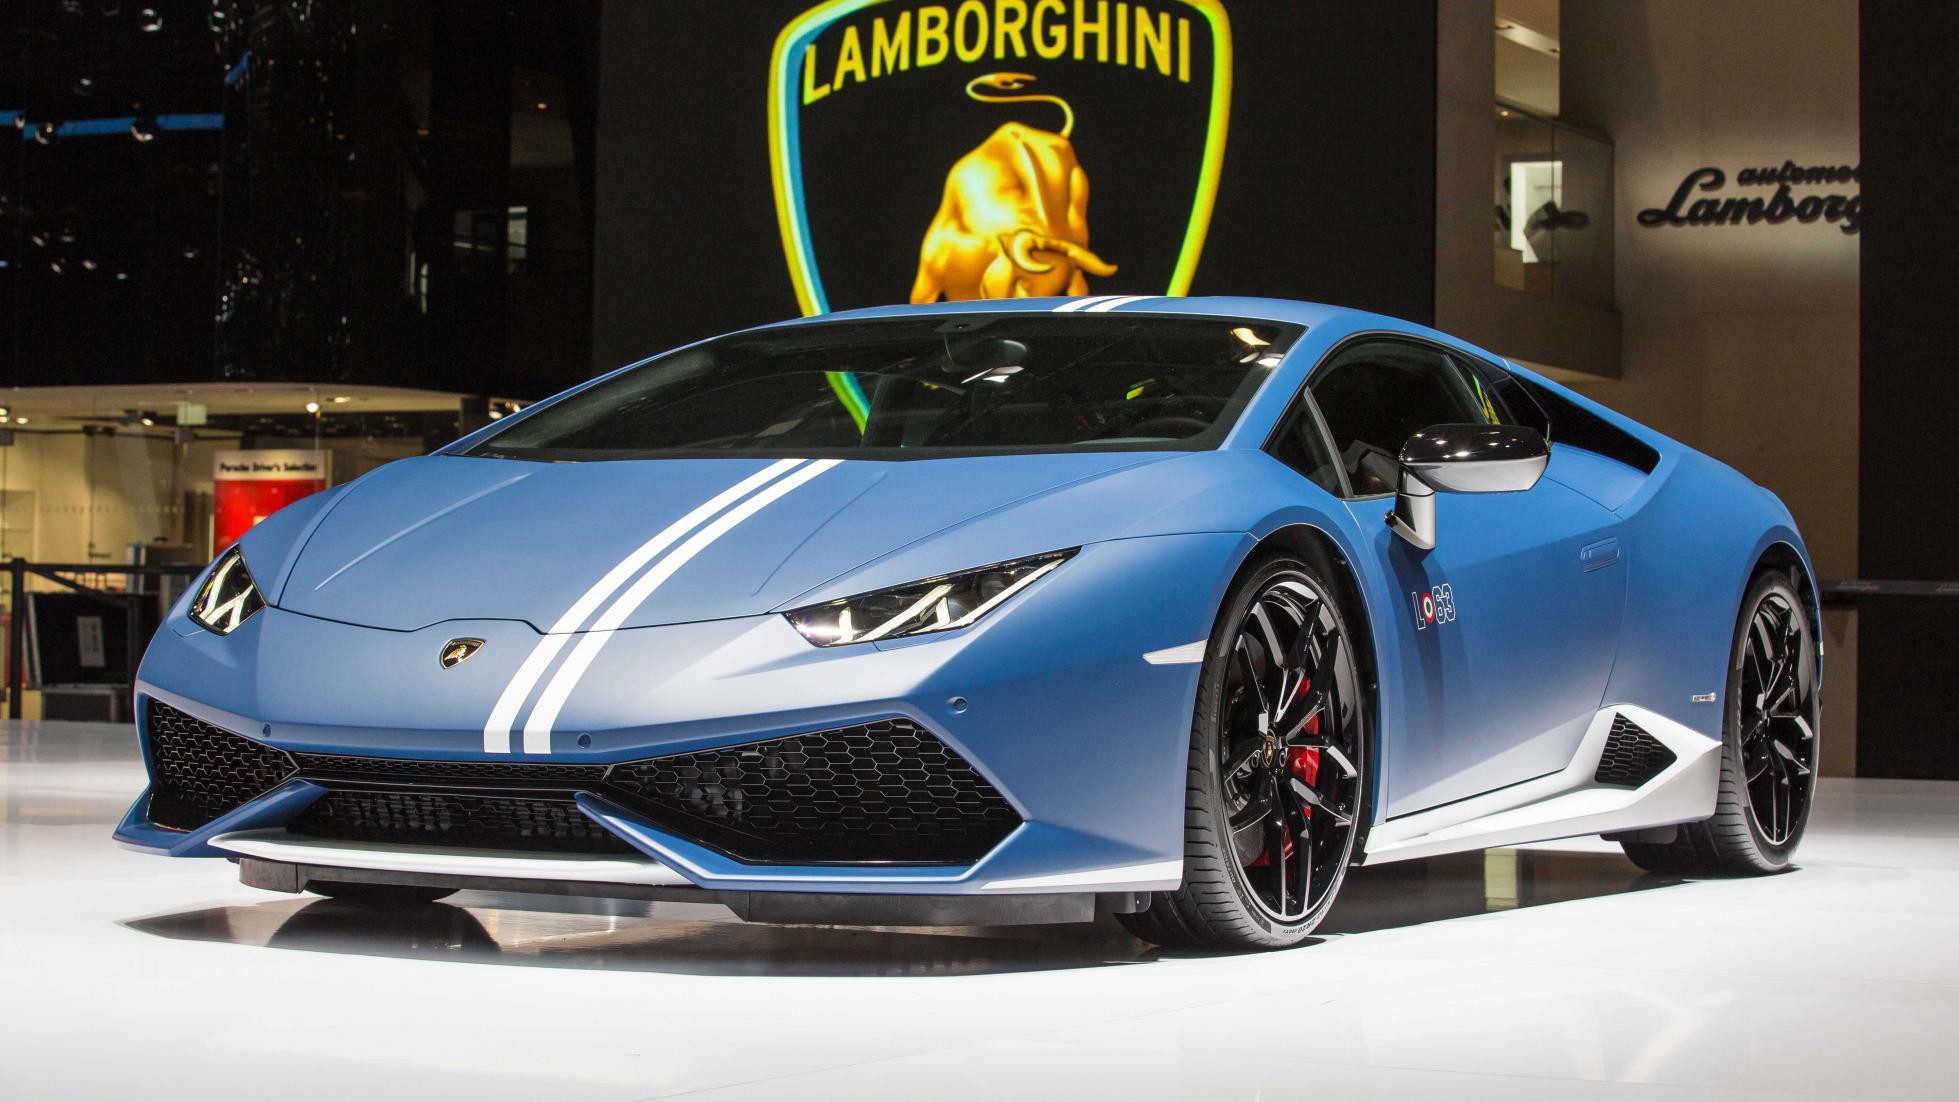 Limited Edition Lamborghini Huracan Avio Launched In India The